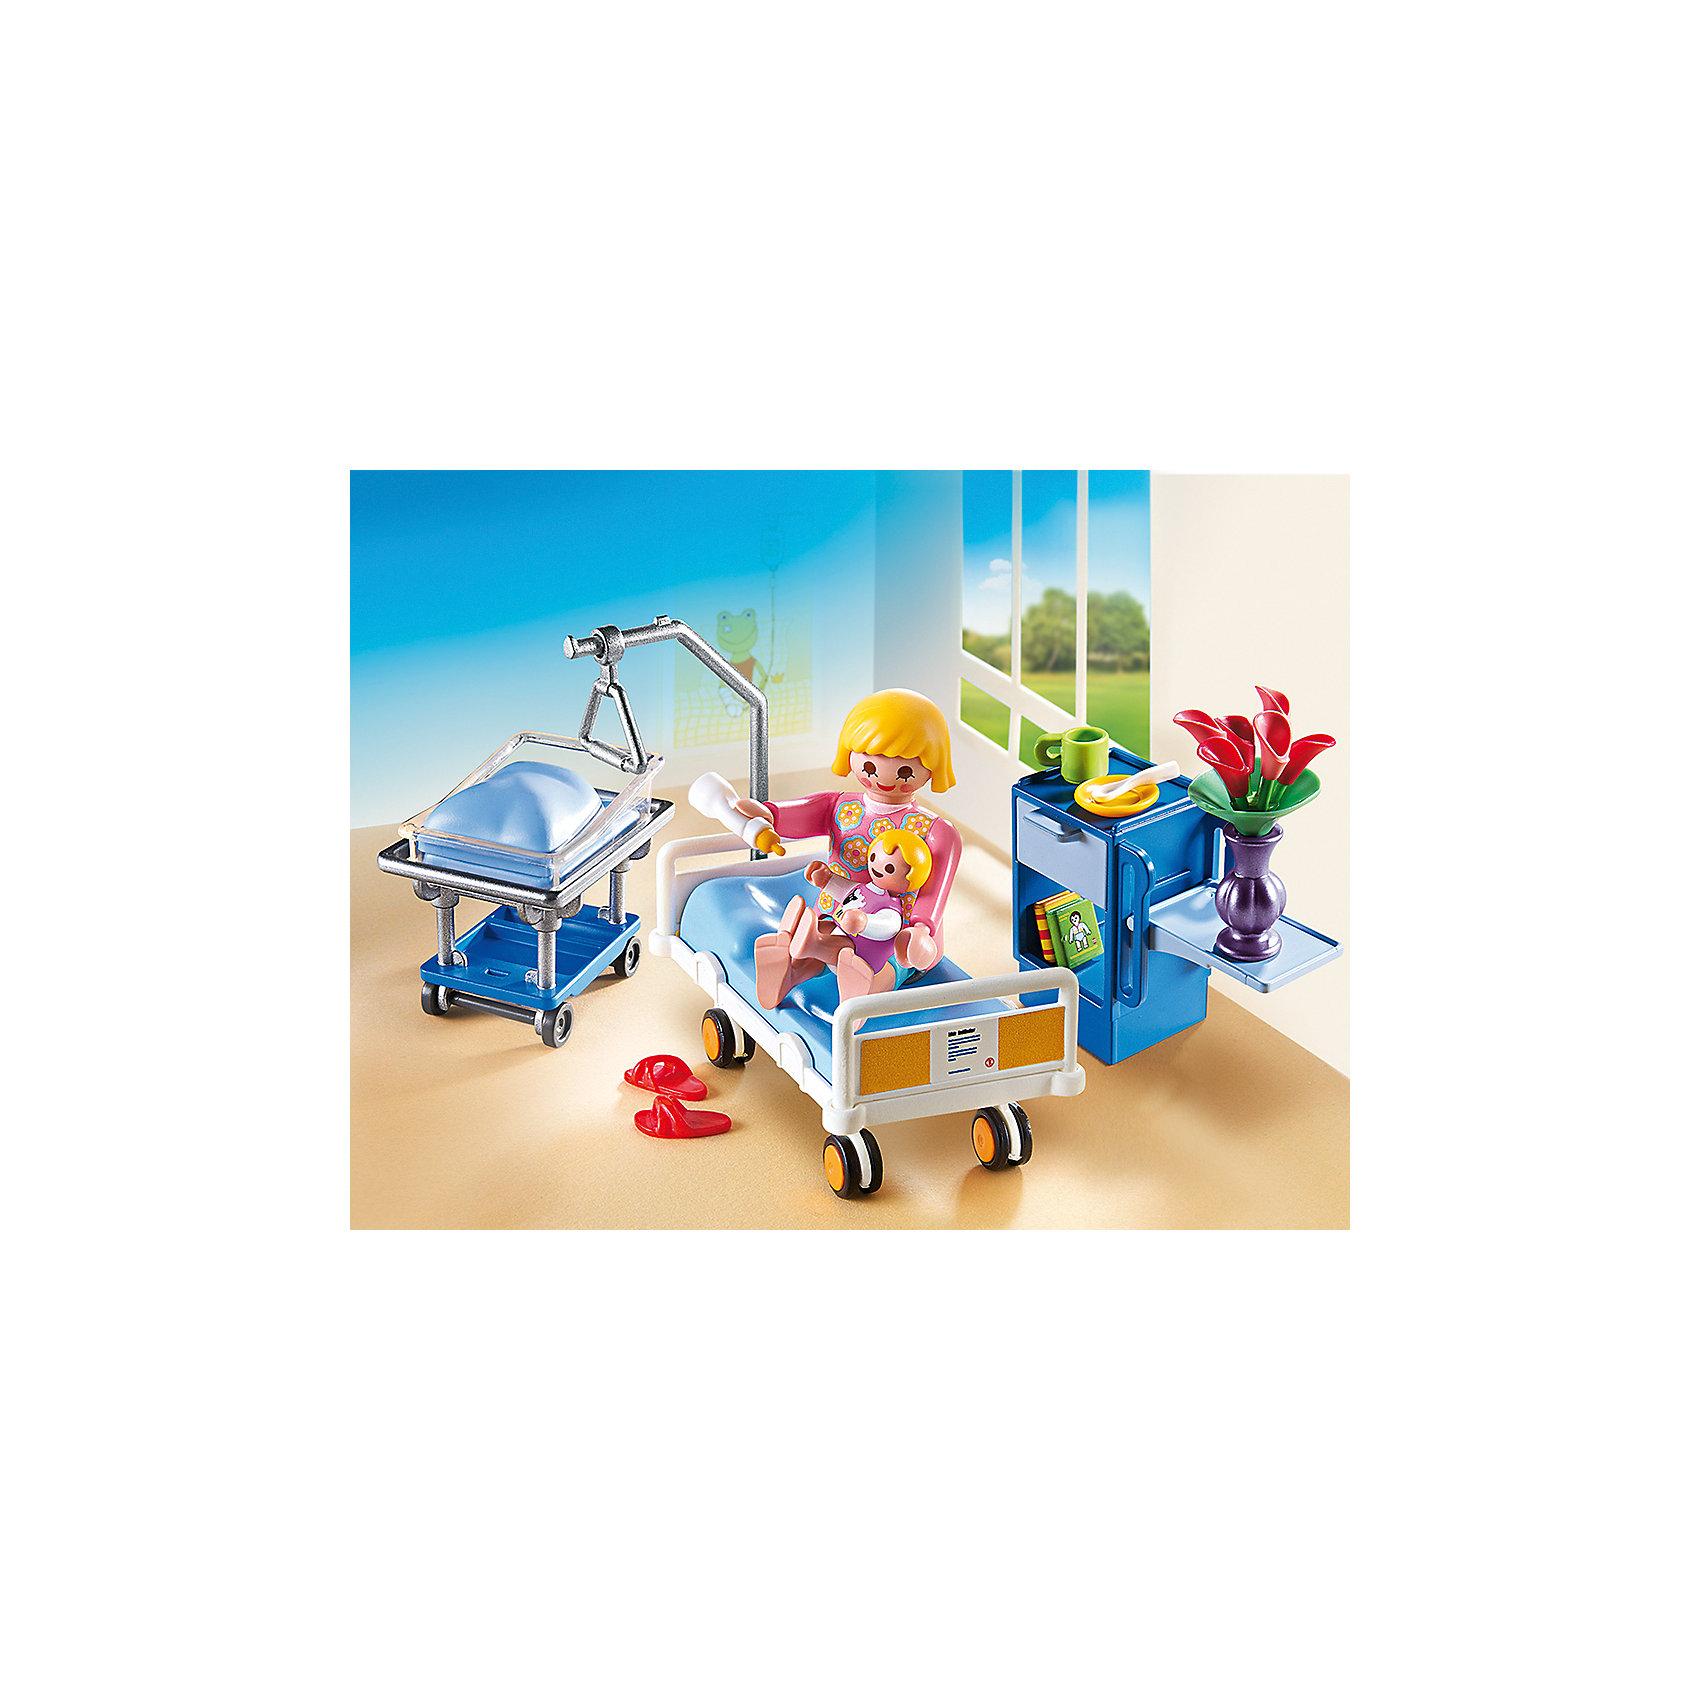 PLAYMOBIL® Детская клиника: Комната матери и ребенка, PLAYMOBIL playmobil® playmobil 5546 парк развлечений продавец шаров smileyworld